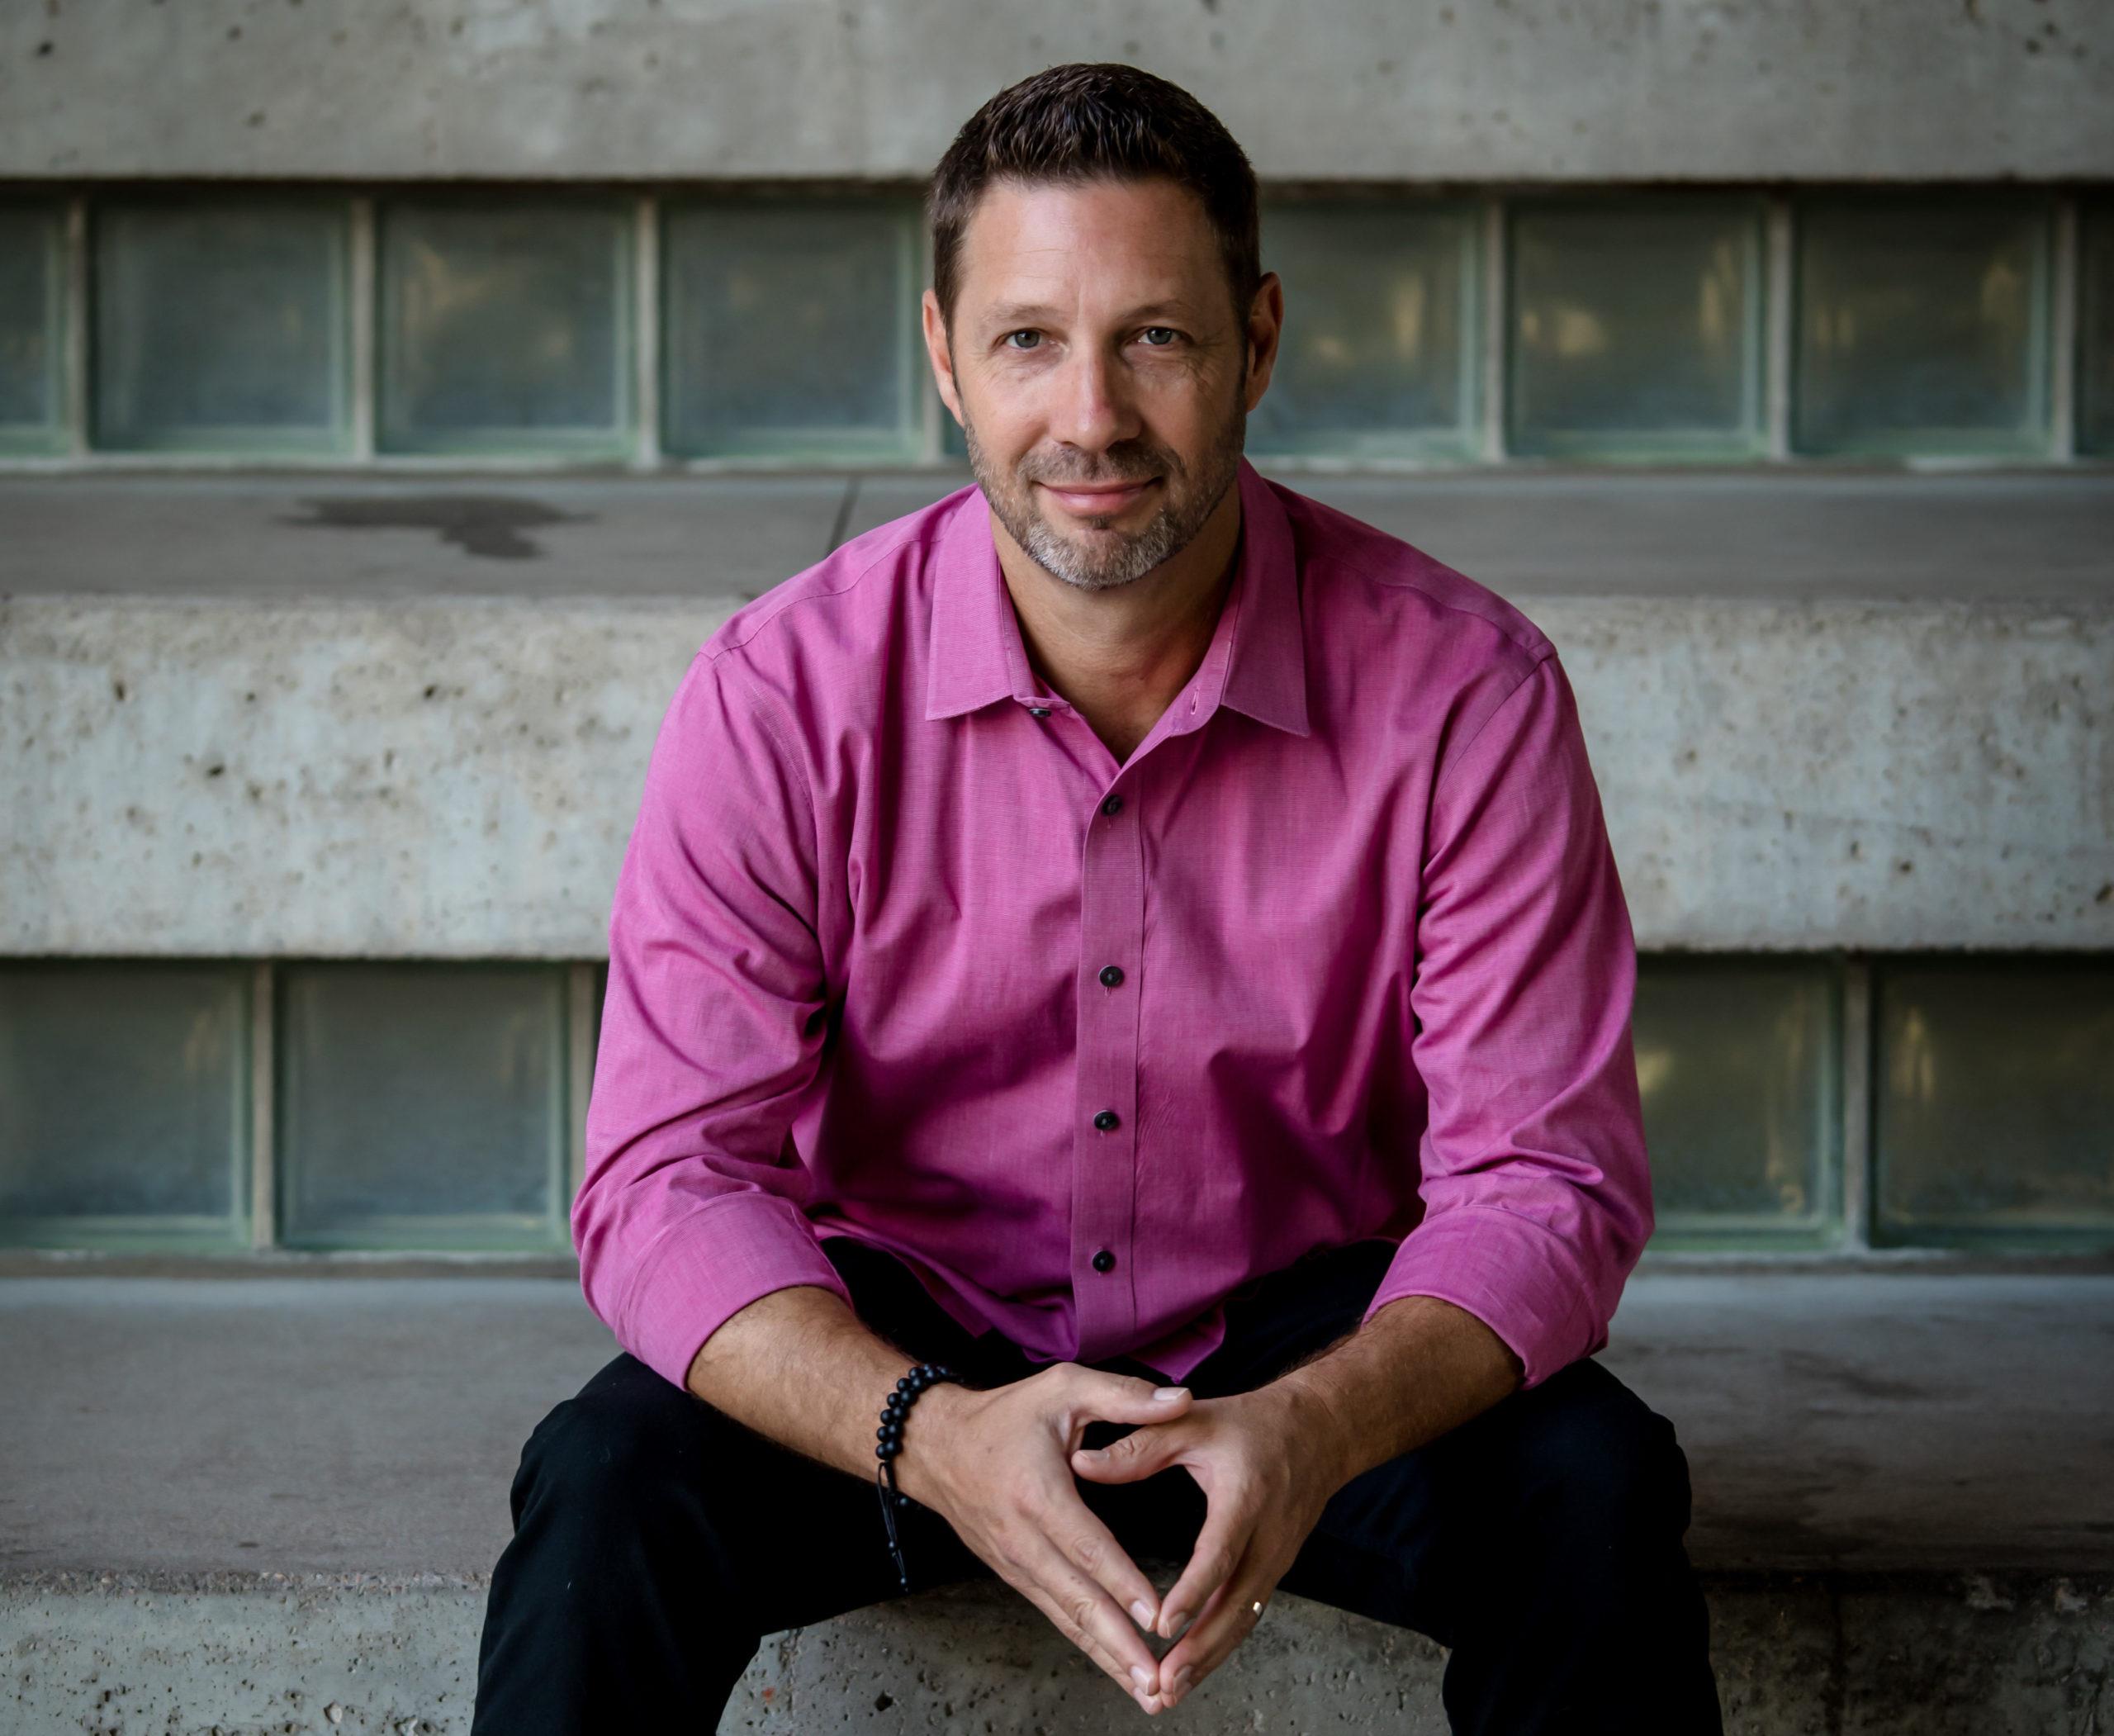 CEO Chad Alexander